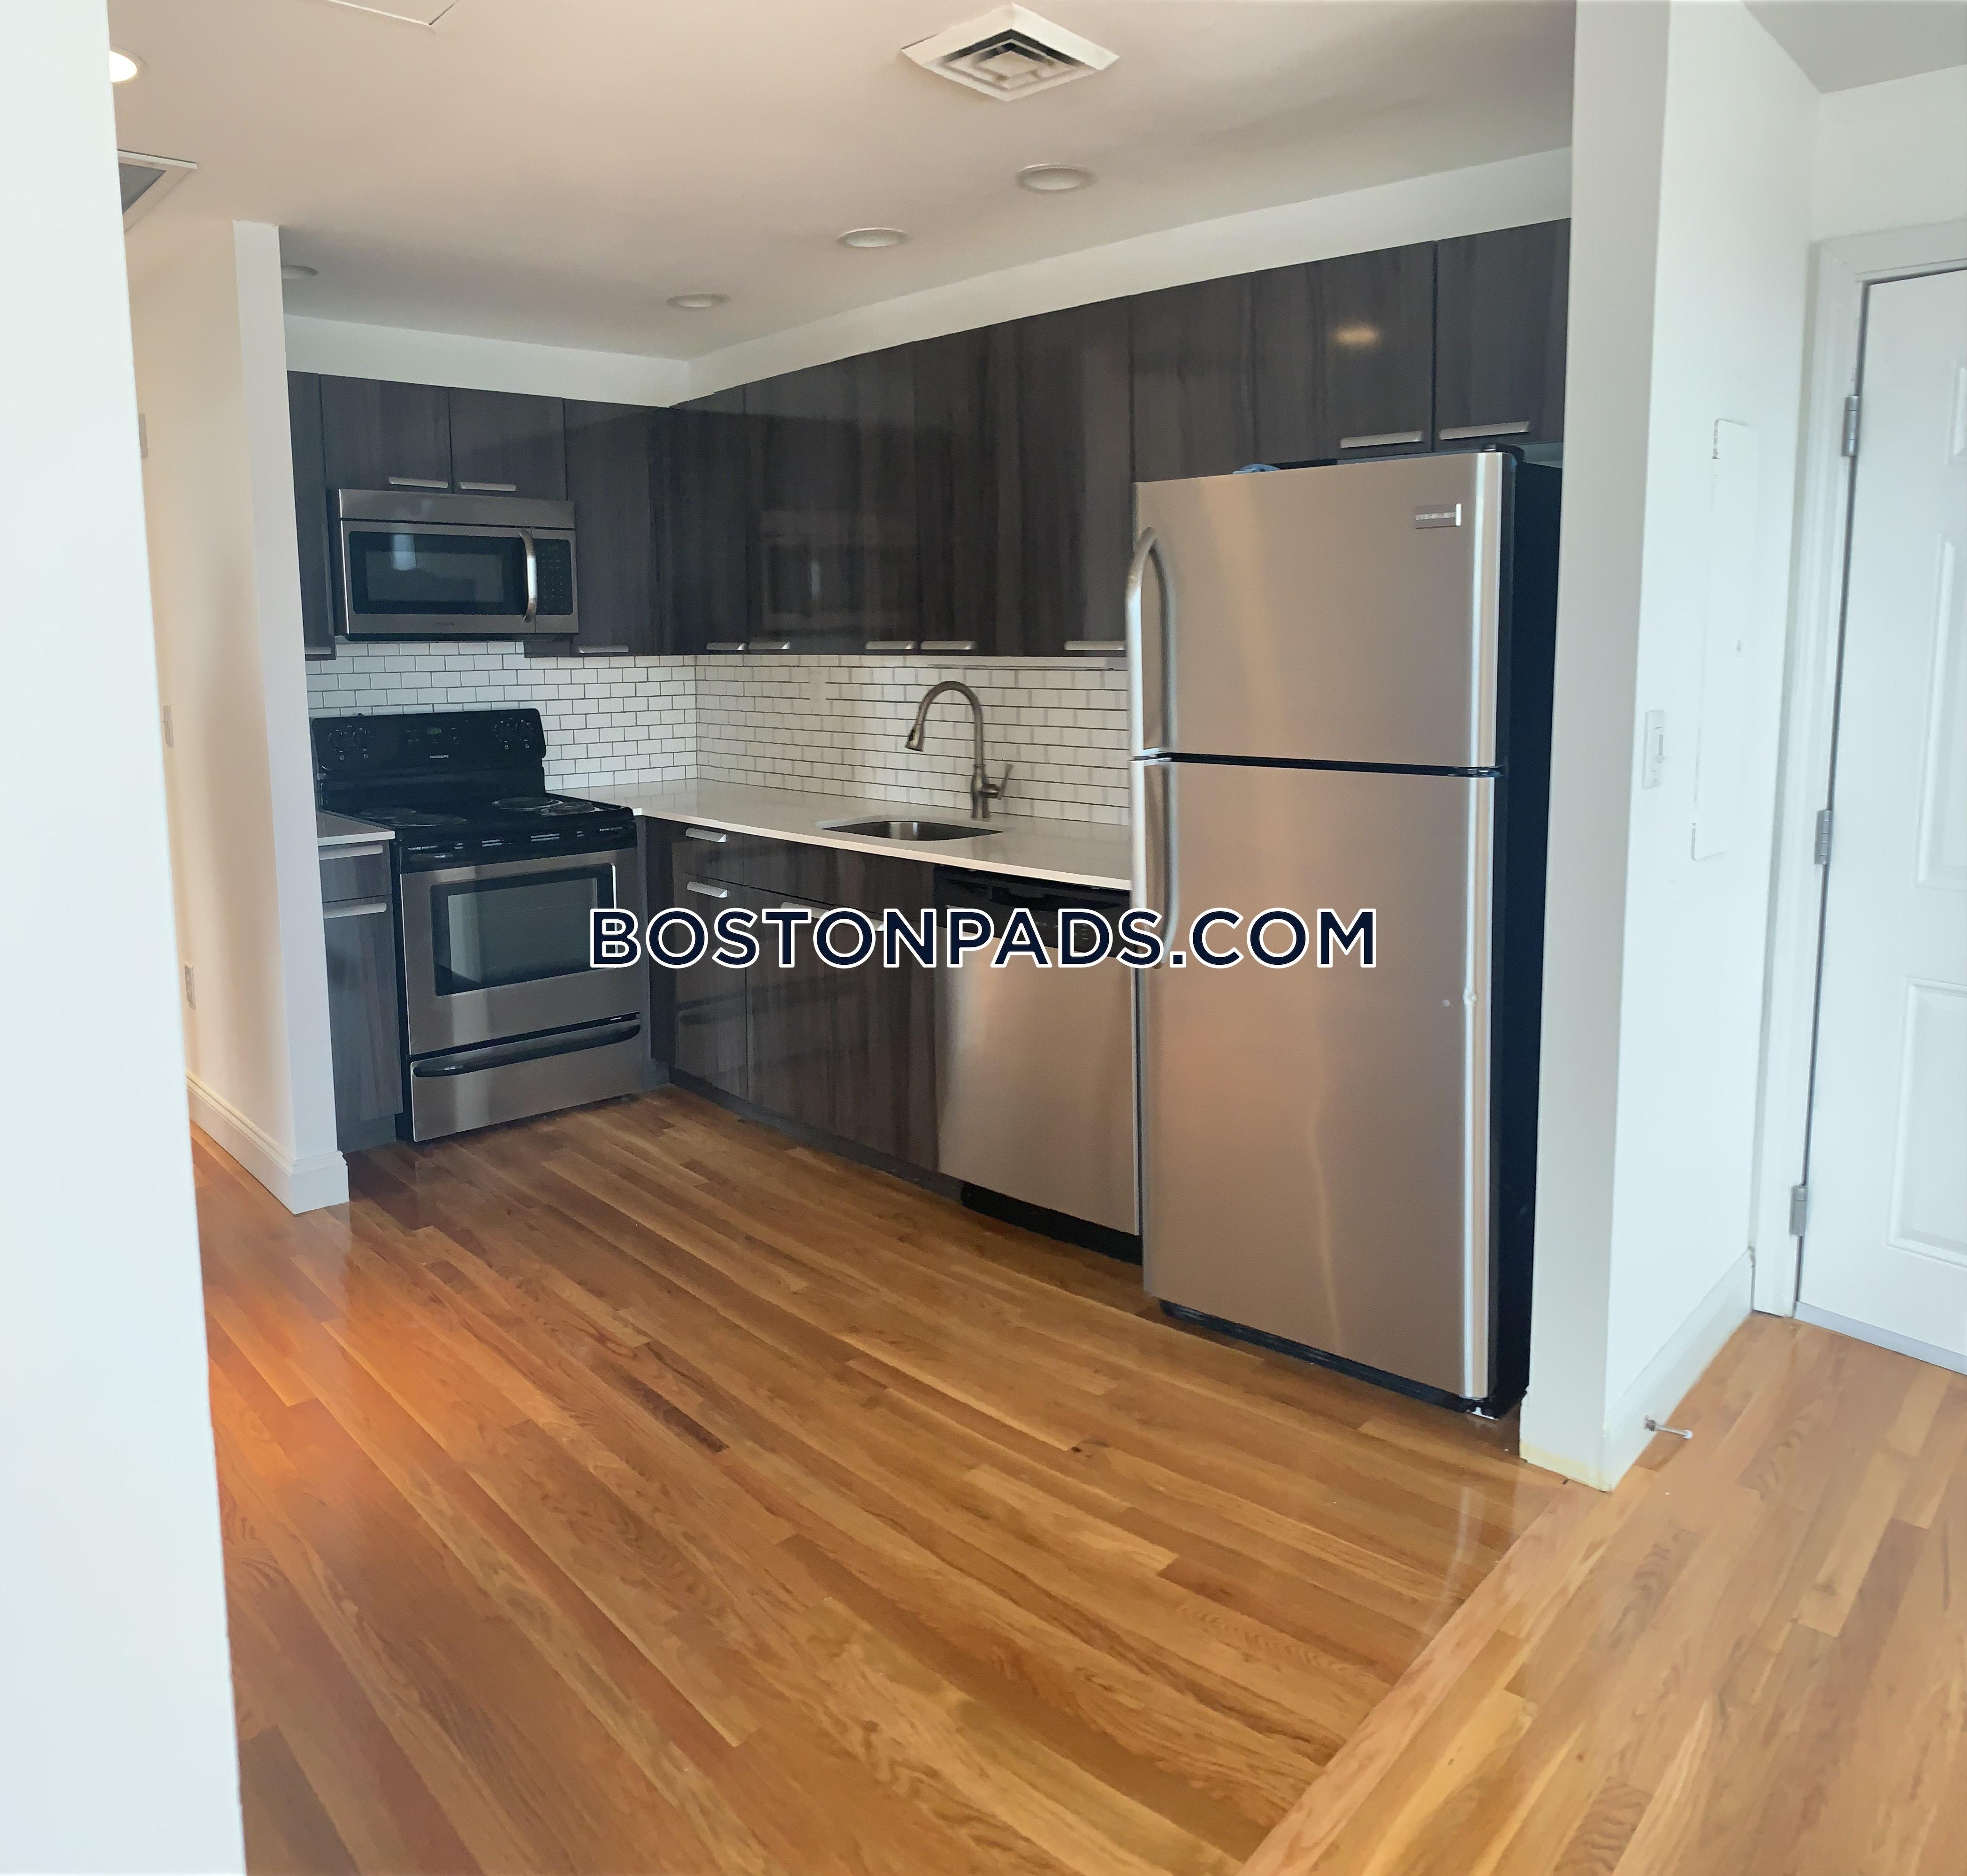 Fenway/kenmore Apartment For Rent 2 Bedrooms 1 Bath Boston